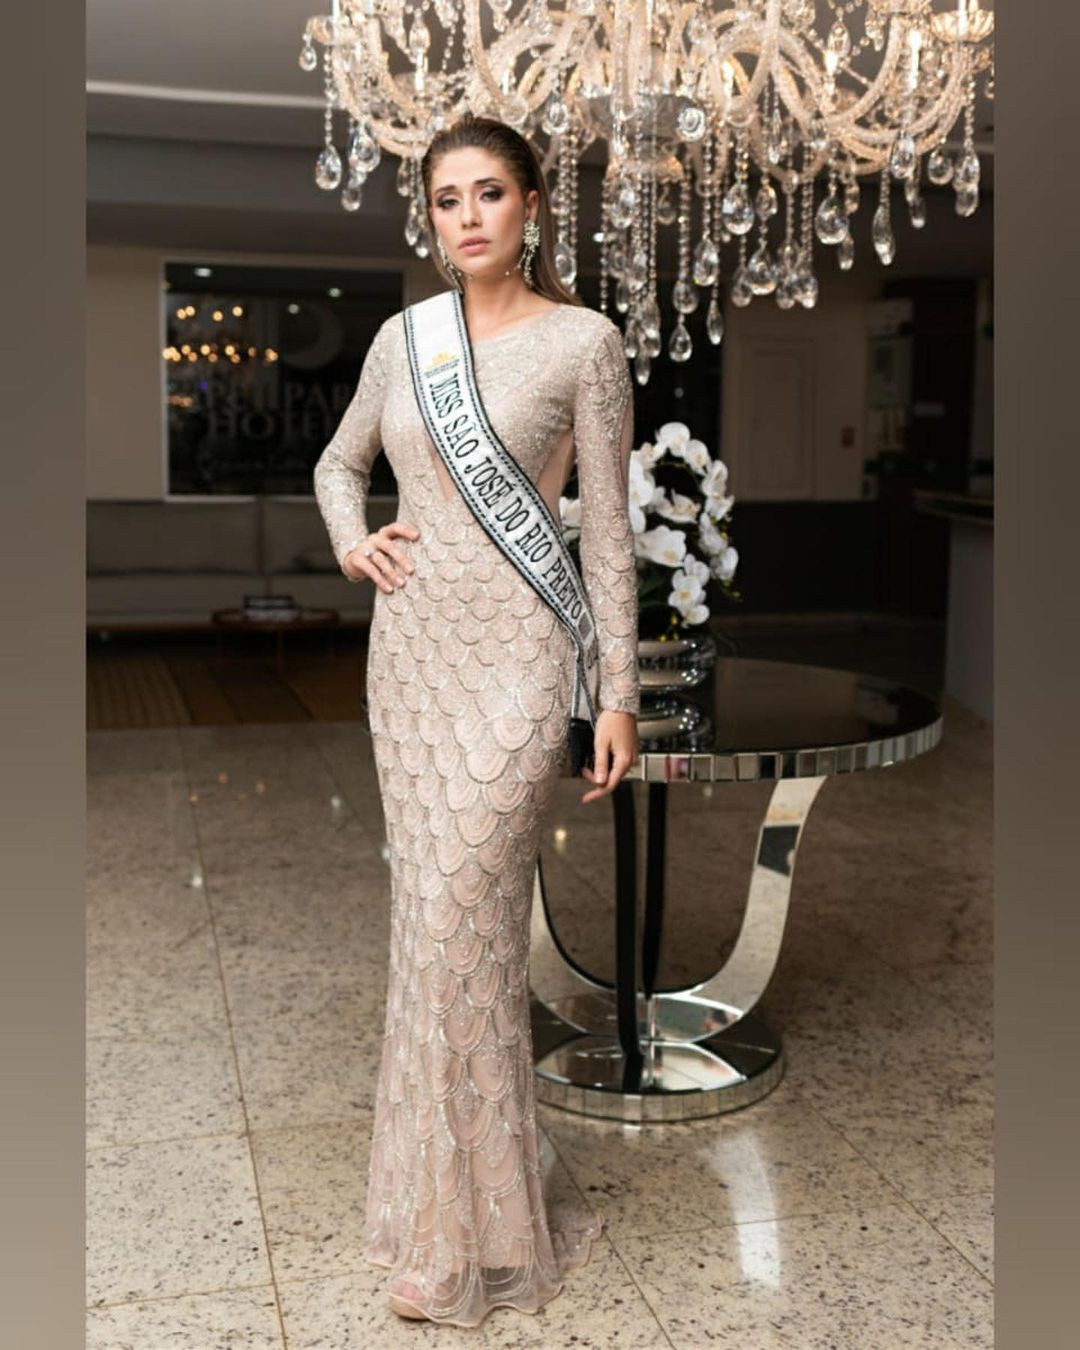 candidatas a miss sao paulo mundo 2022. BZy9dF